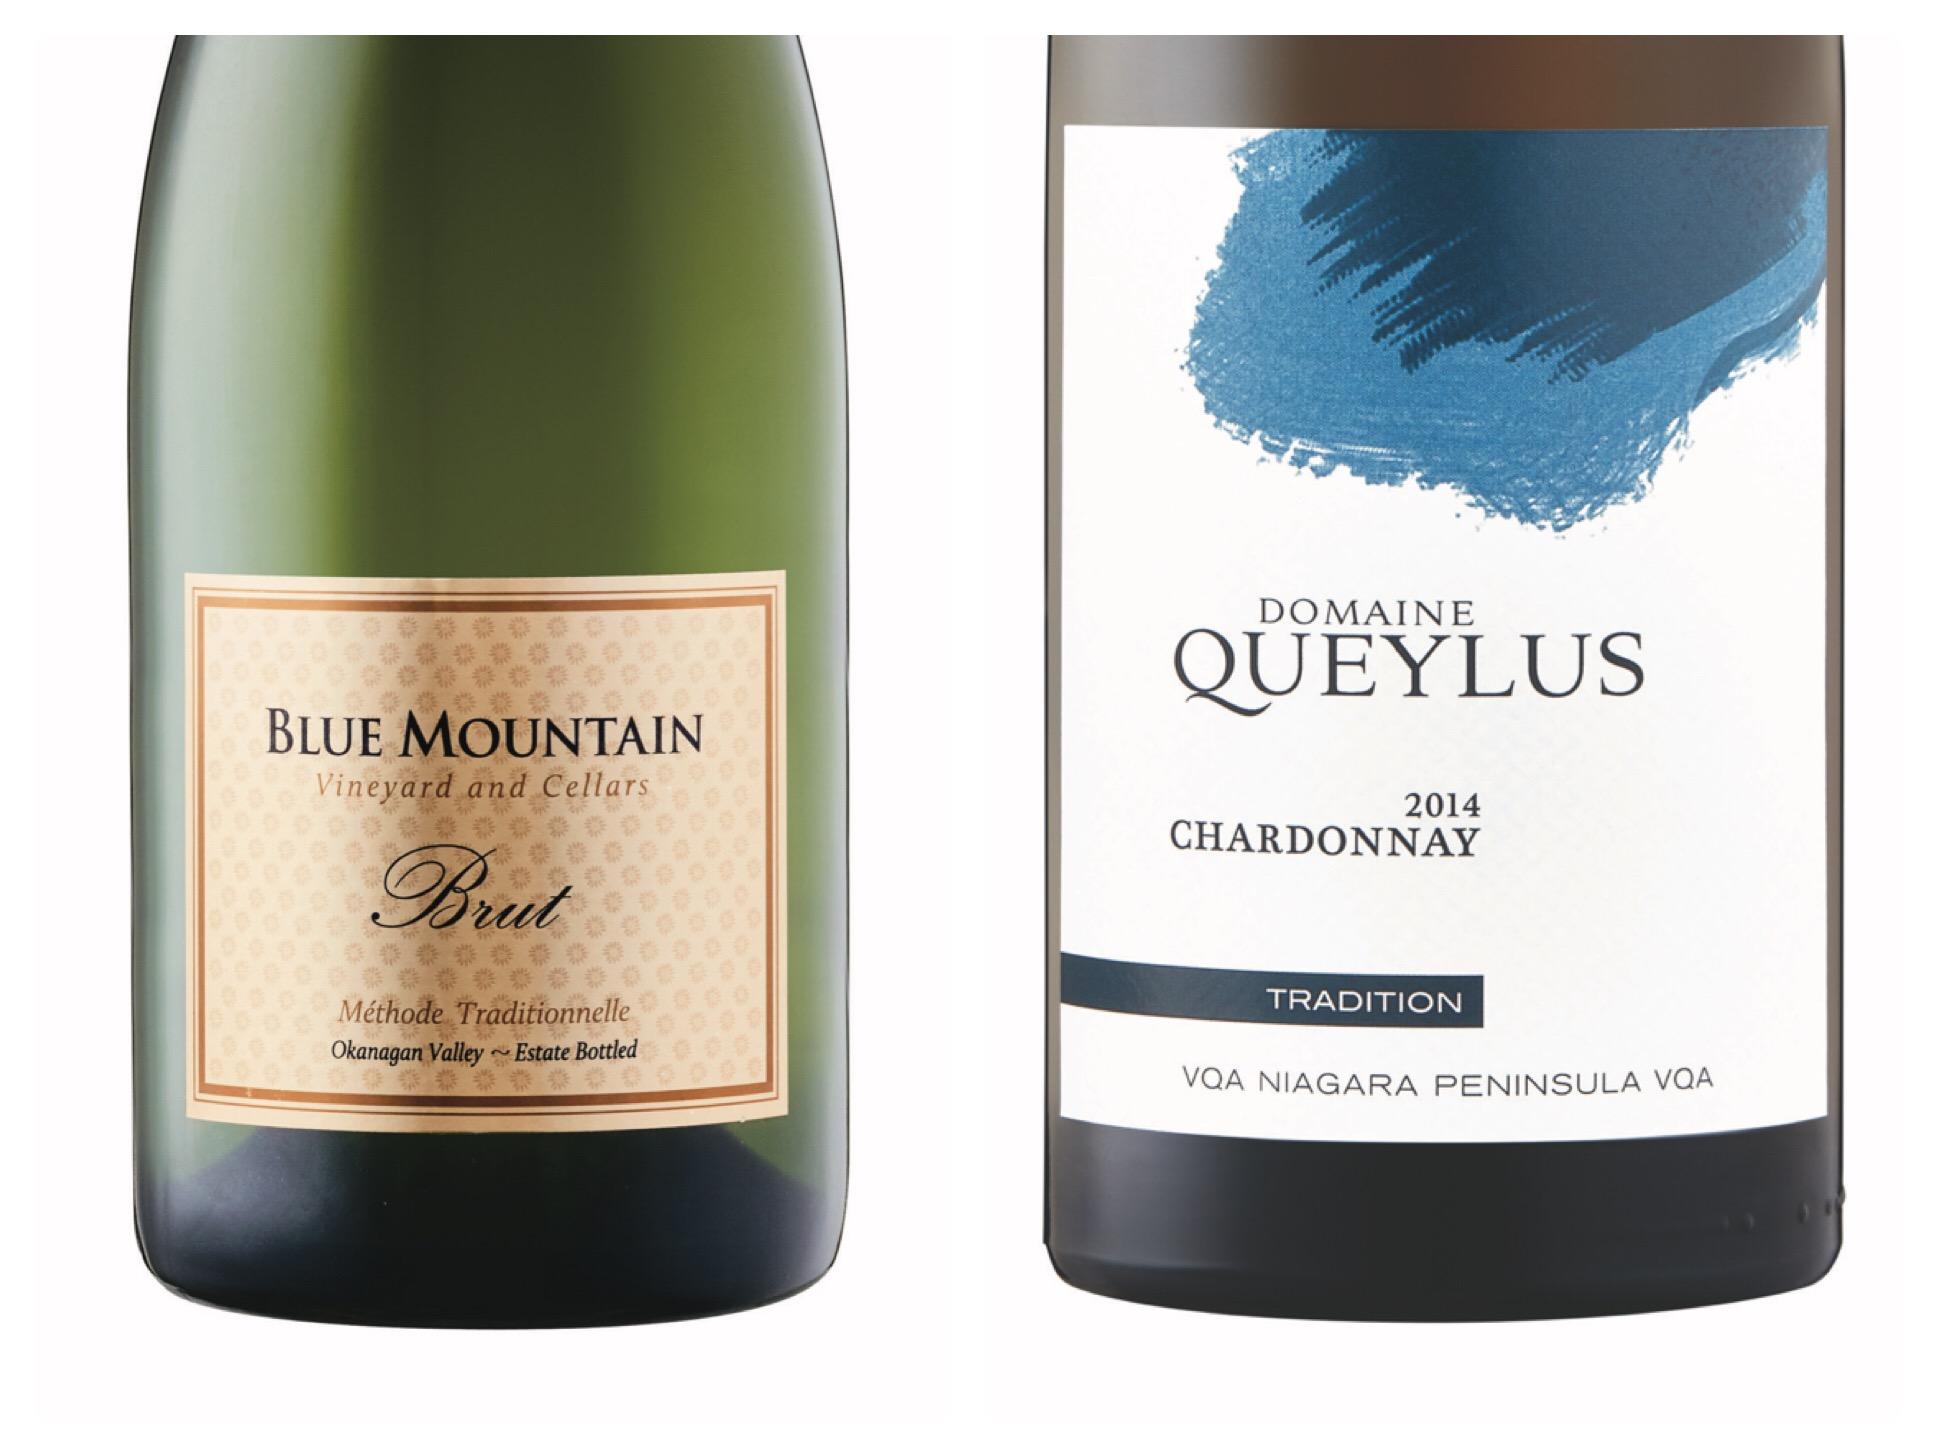 Blue Mountain Gold Label Brut Sparkling 2014 Domaine